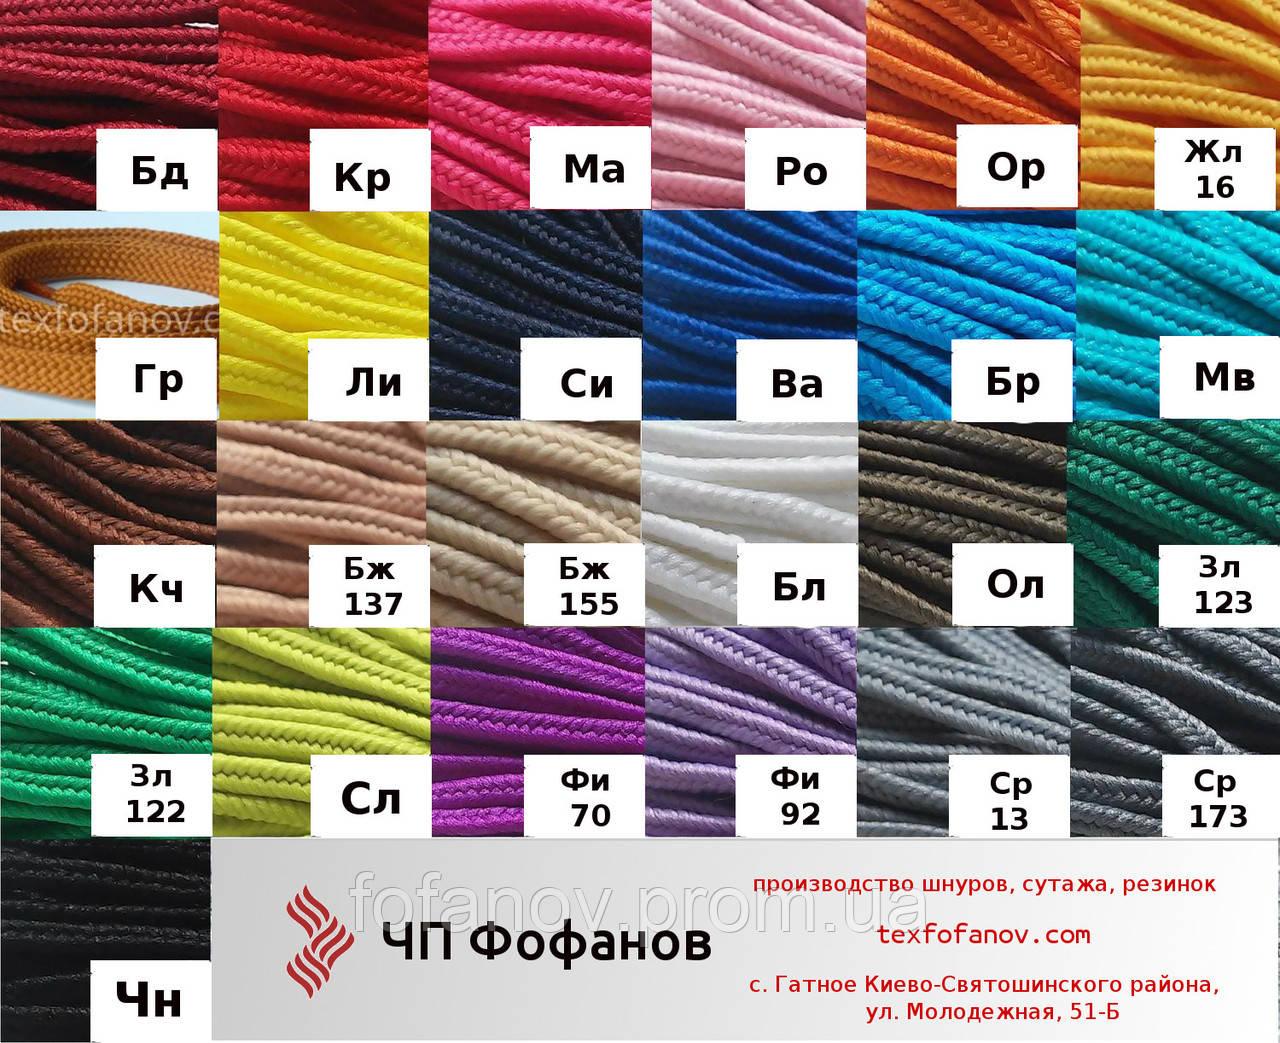 Шнур для вязания ковра своими руками фото 103